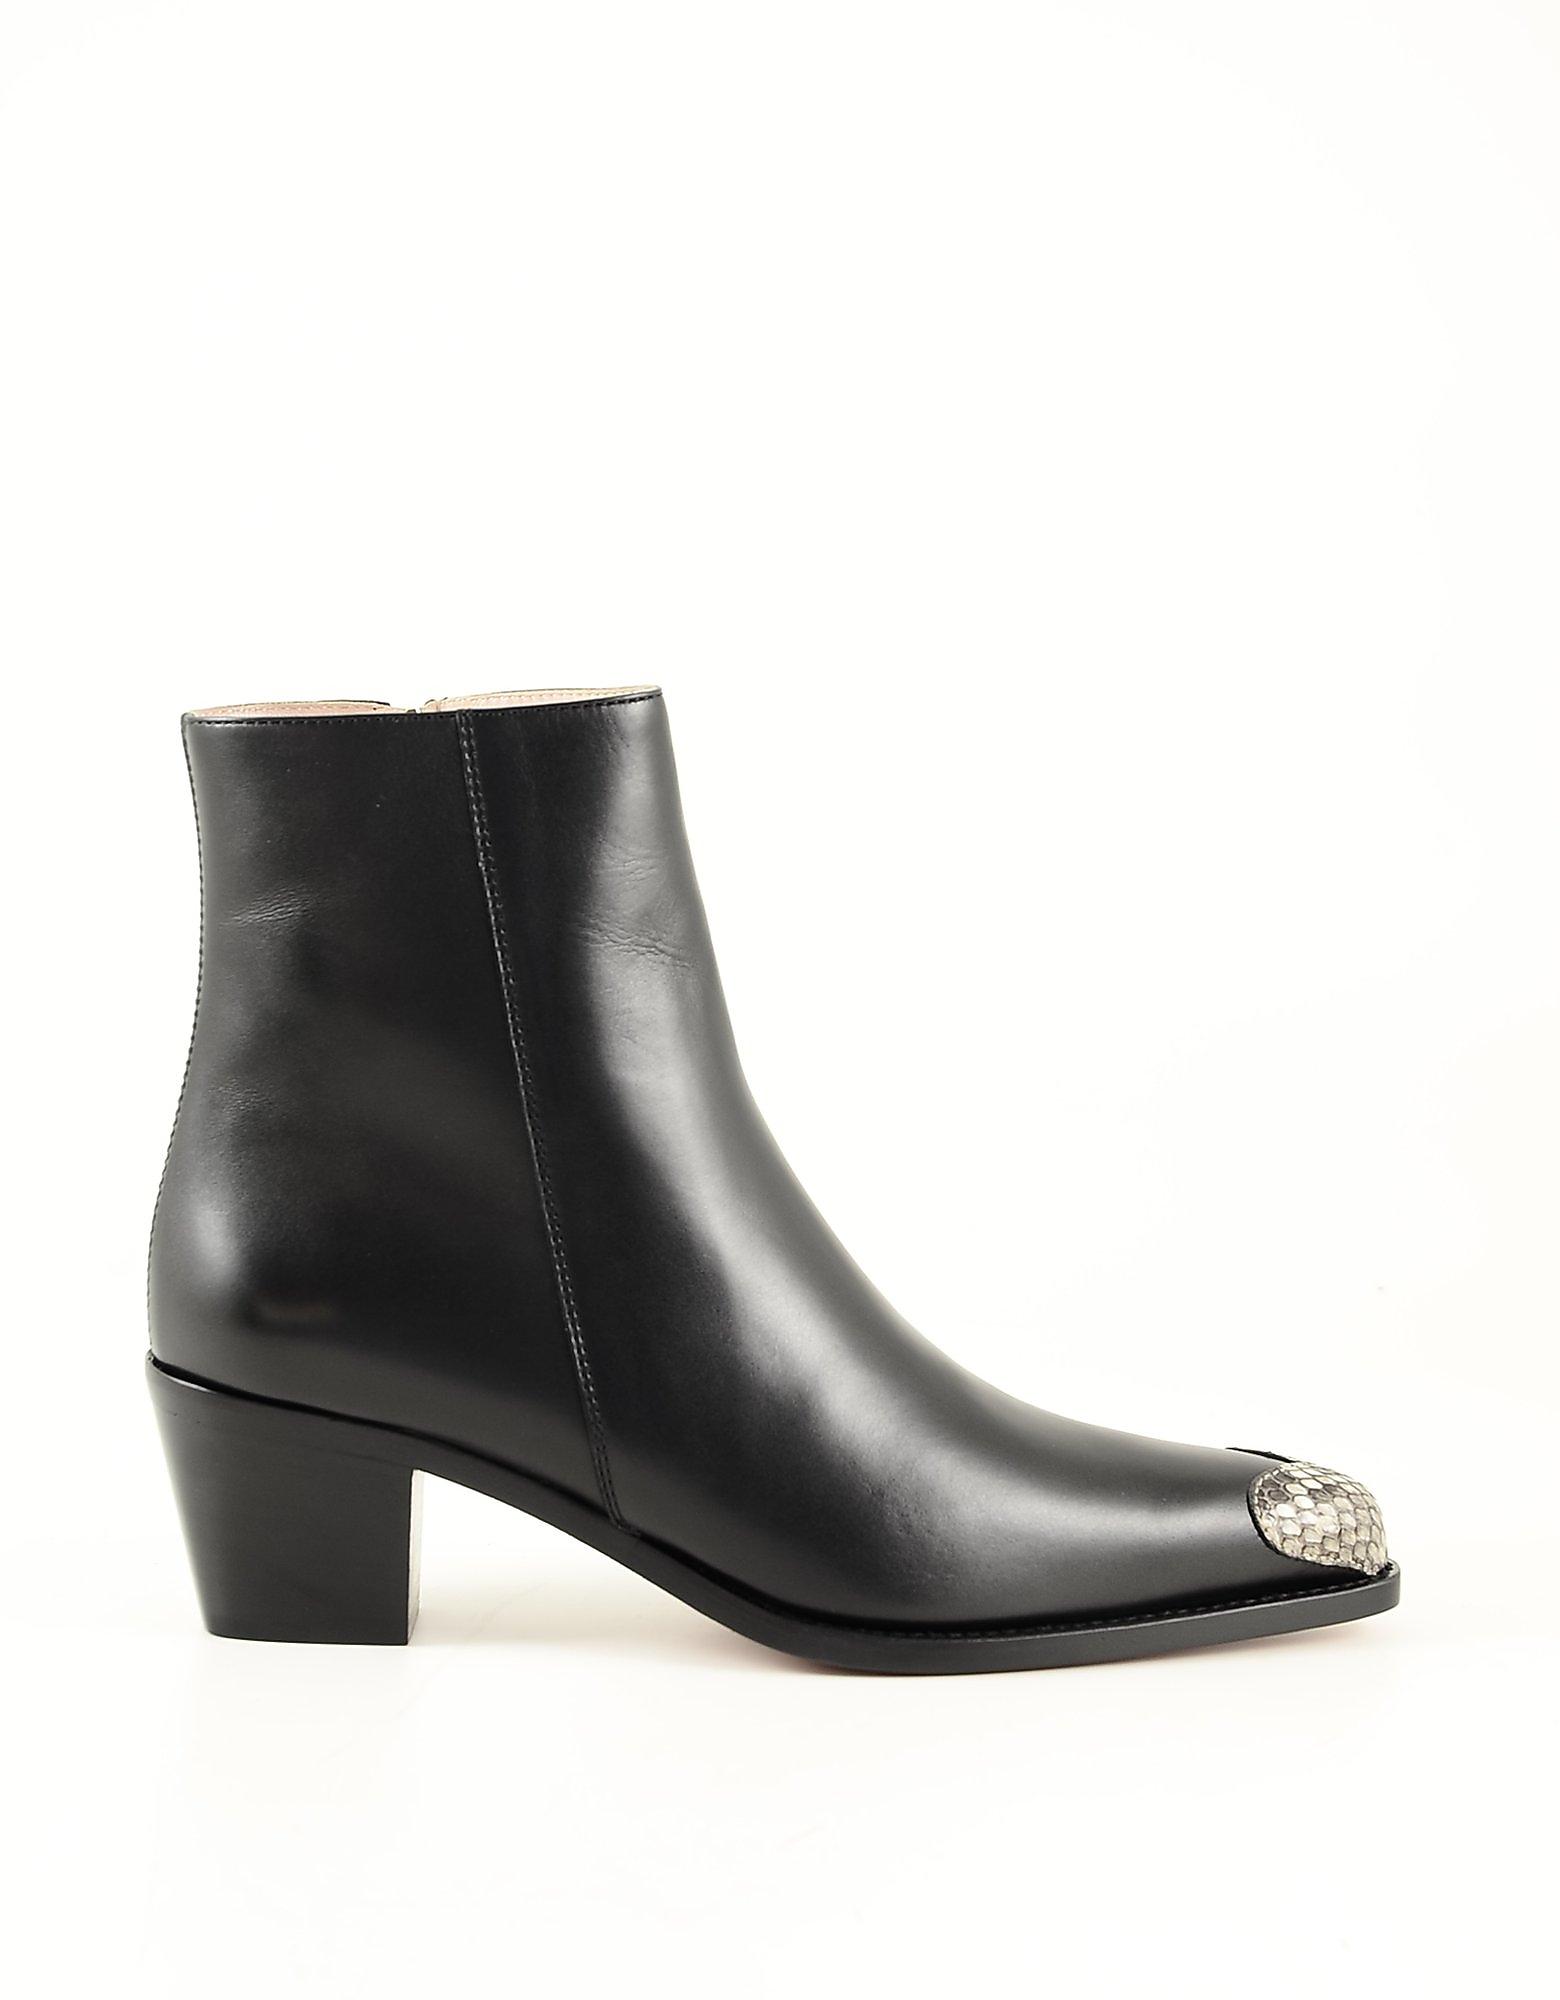 BOYY Designer Shoes, Black Leather Women's Ankle Boots